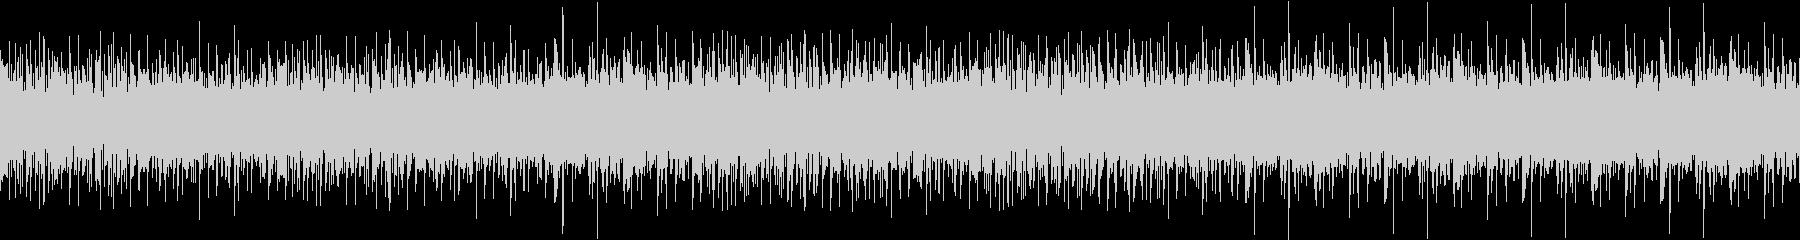 144bpm、F-Maj、16ビートの未再生の波形